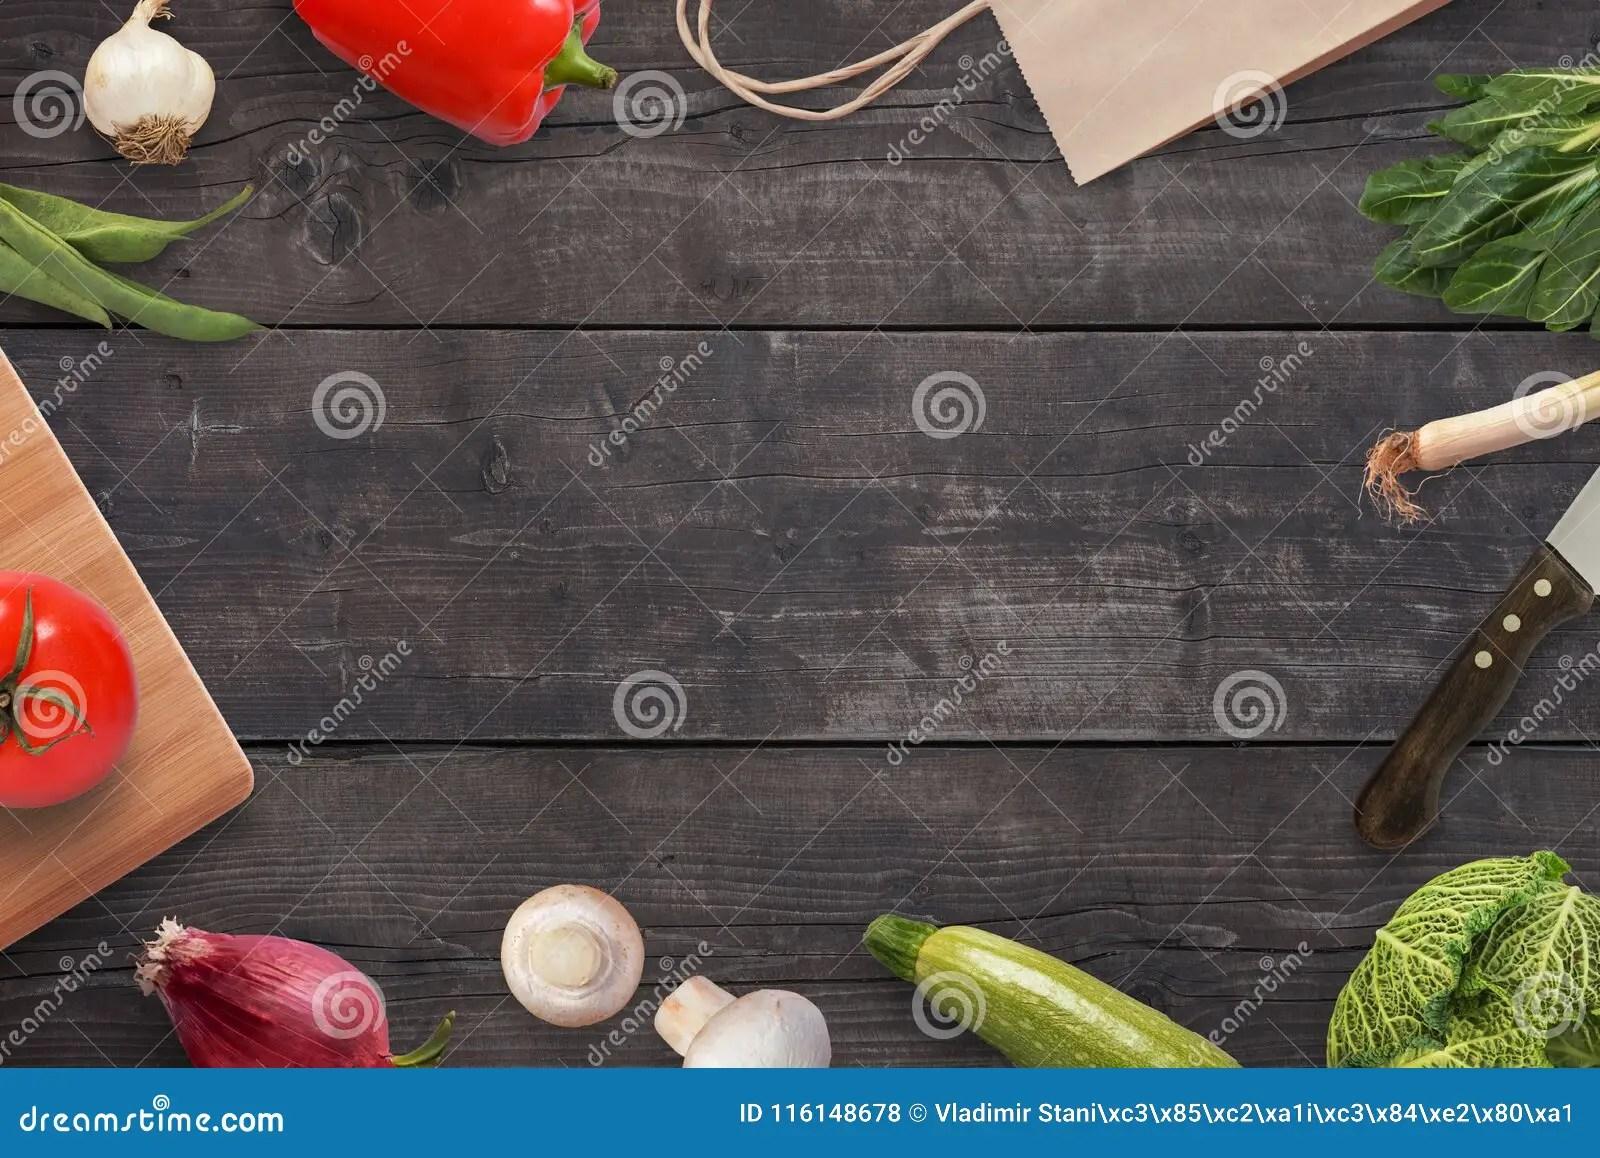 kitchen prep table parts of a faucet 准备在厨房用桌上的饭食与许多菜库存照片 图片包括有服务台 绿色 健康 准备在厨房用桌上的饭食与许多菜